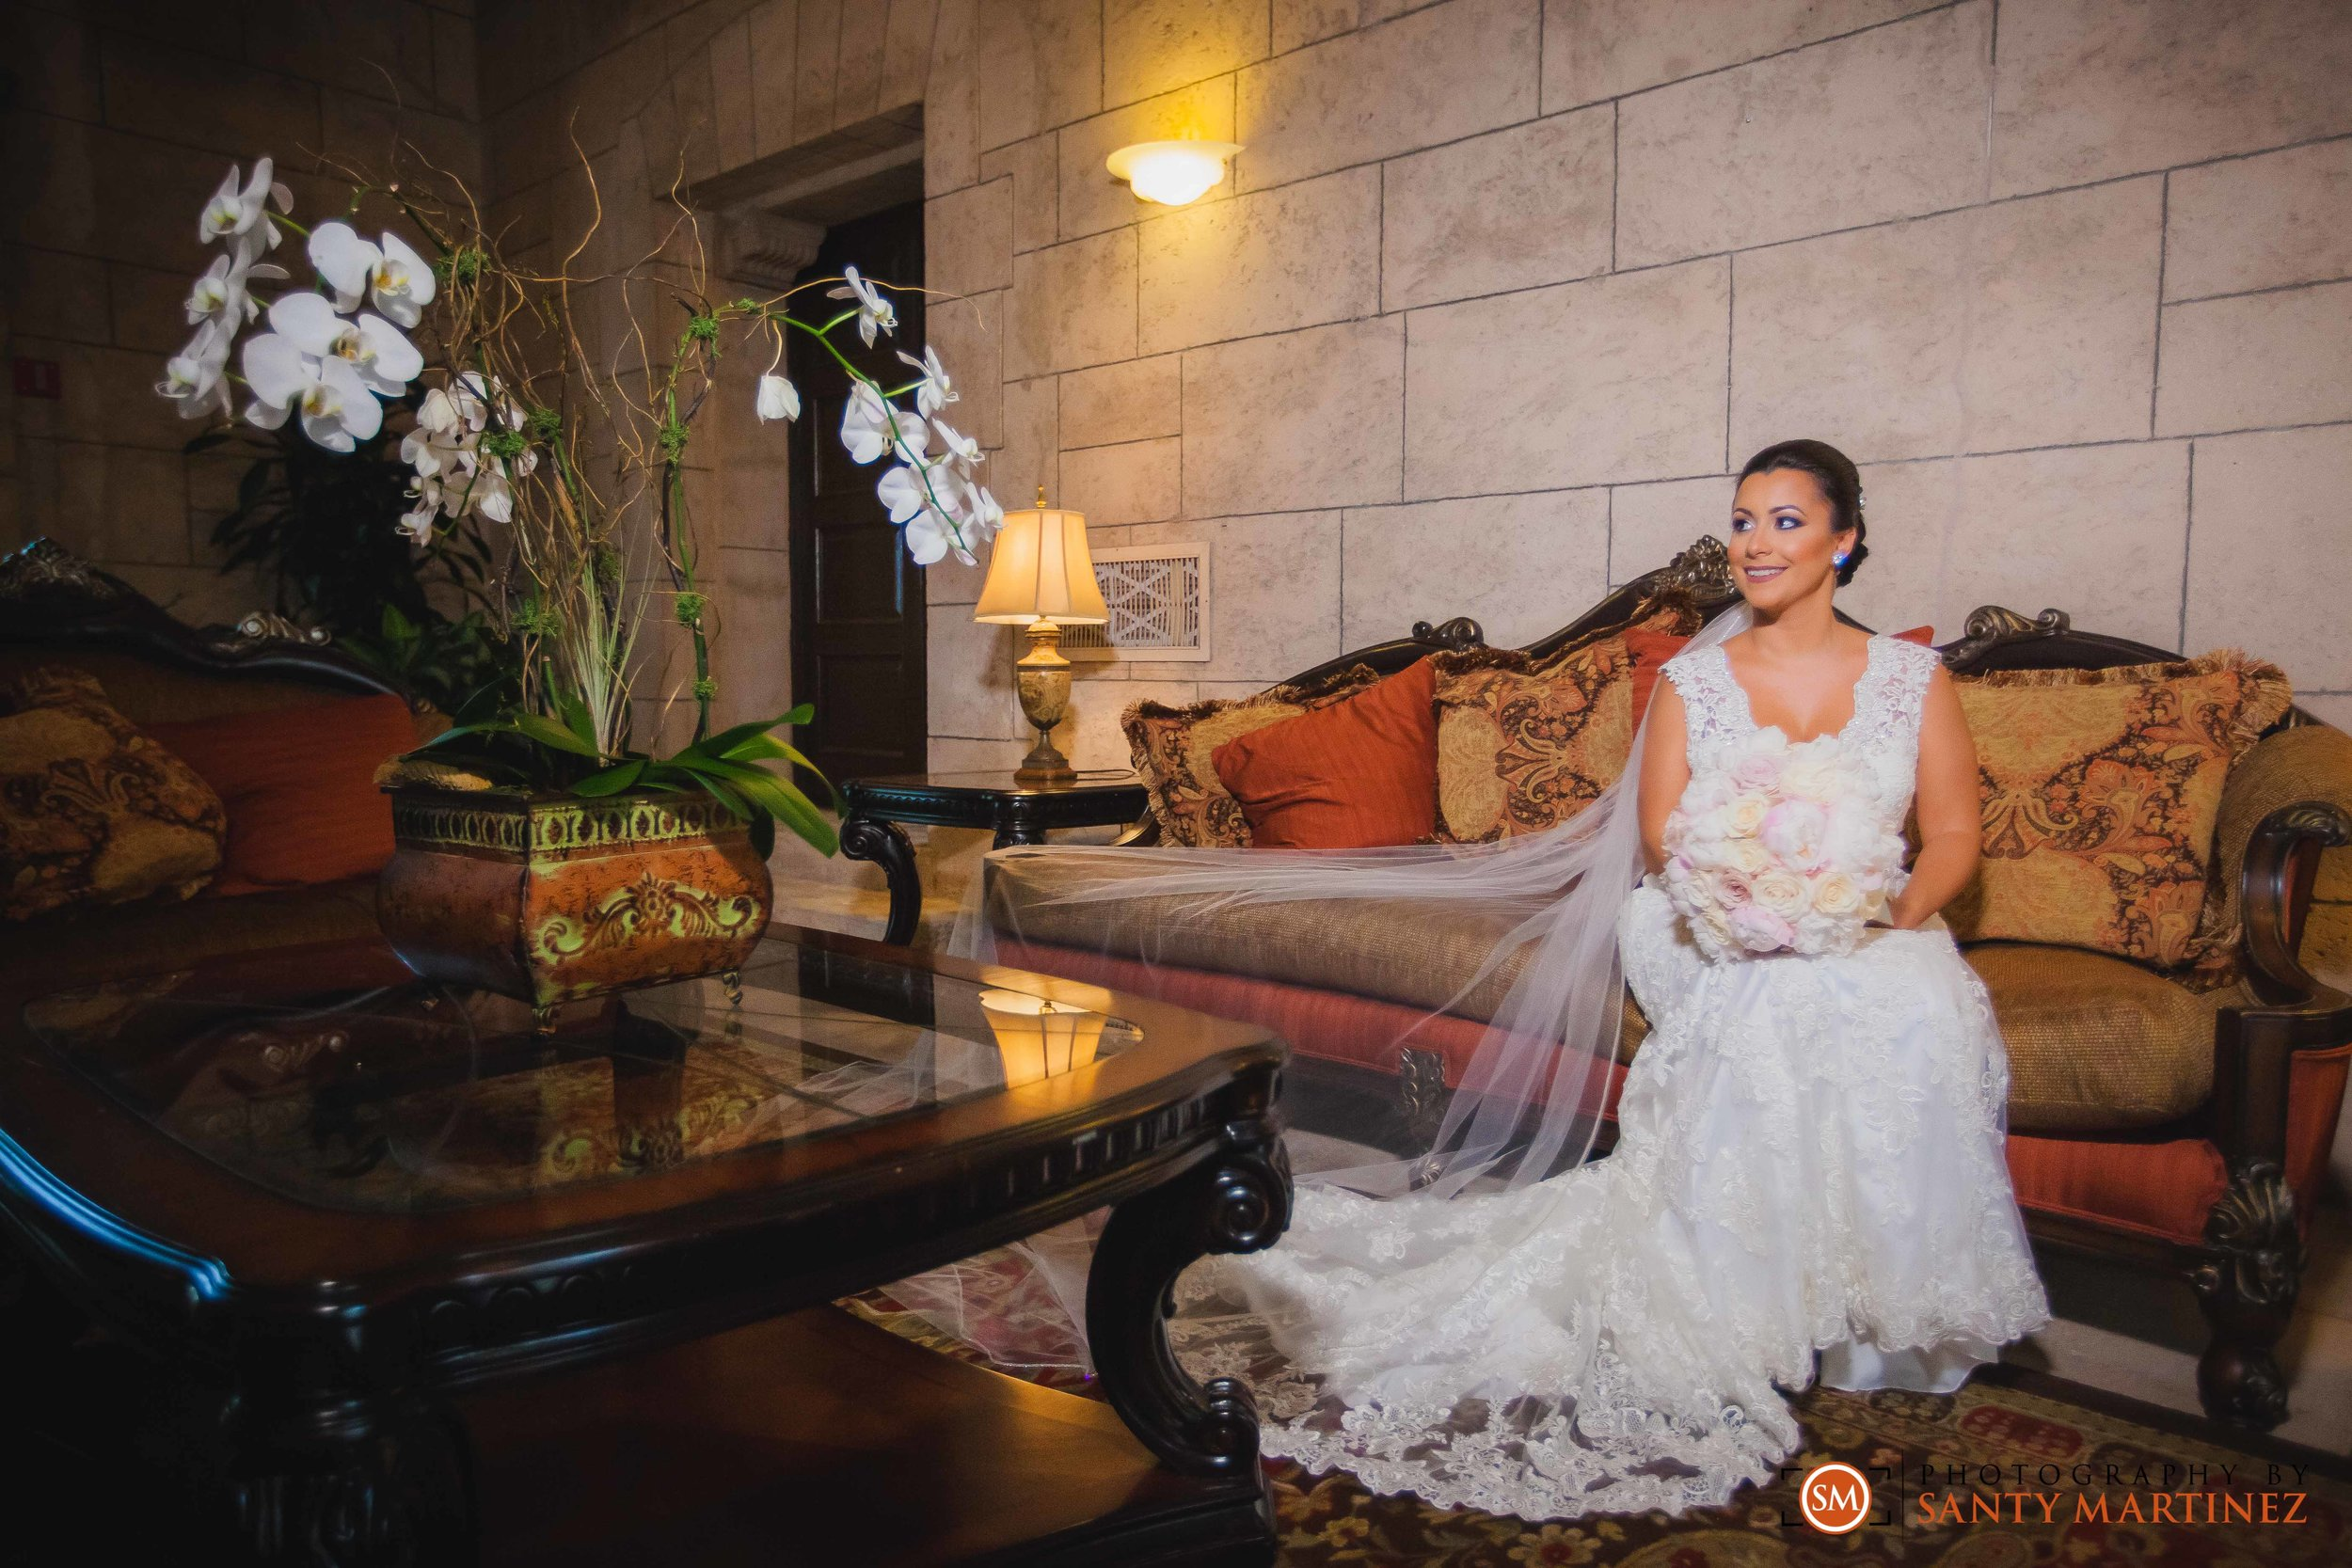 Wedding Douglas Entrance - Photography by Santy Martinez-1-2.jpg